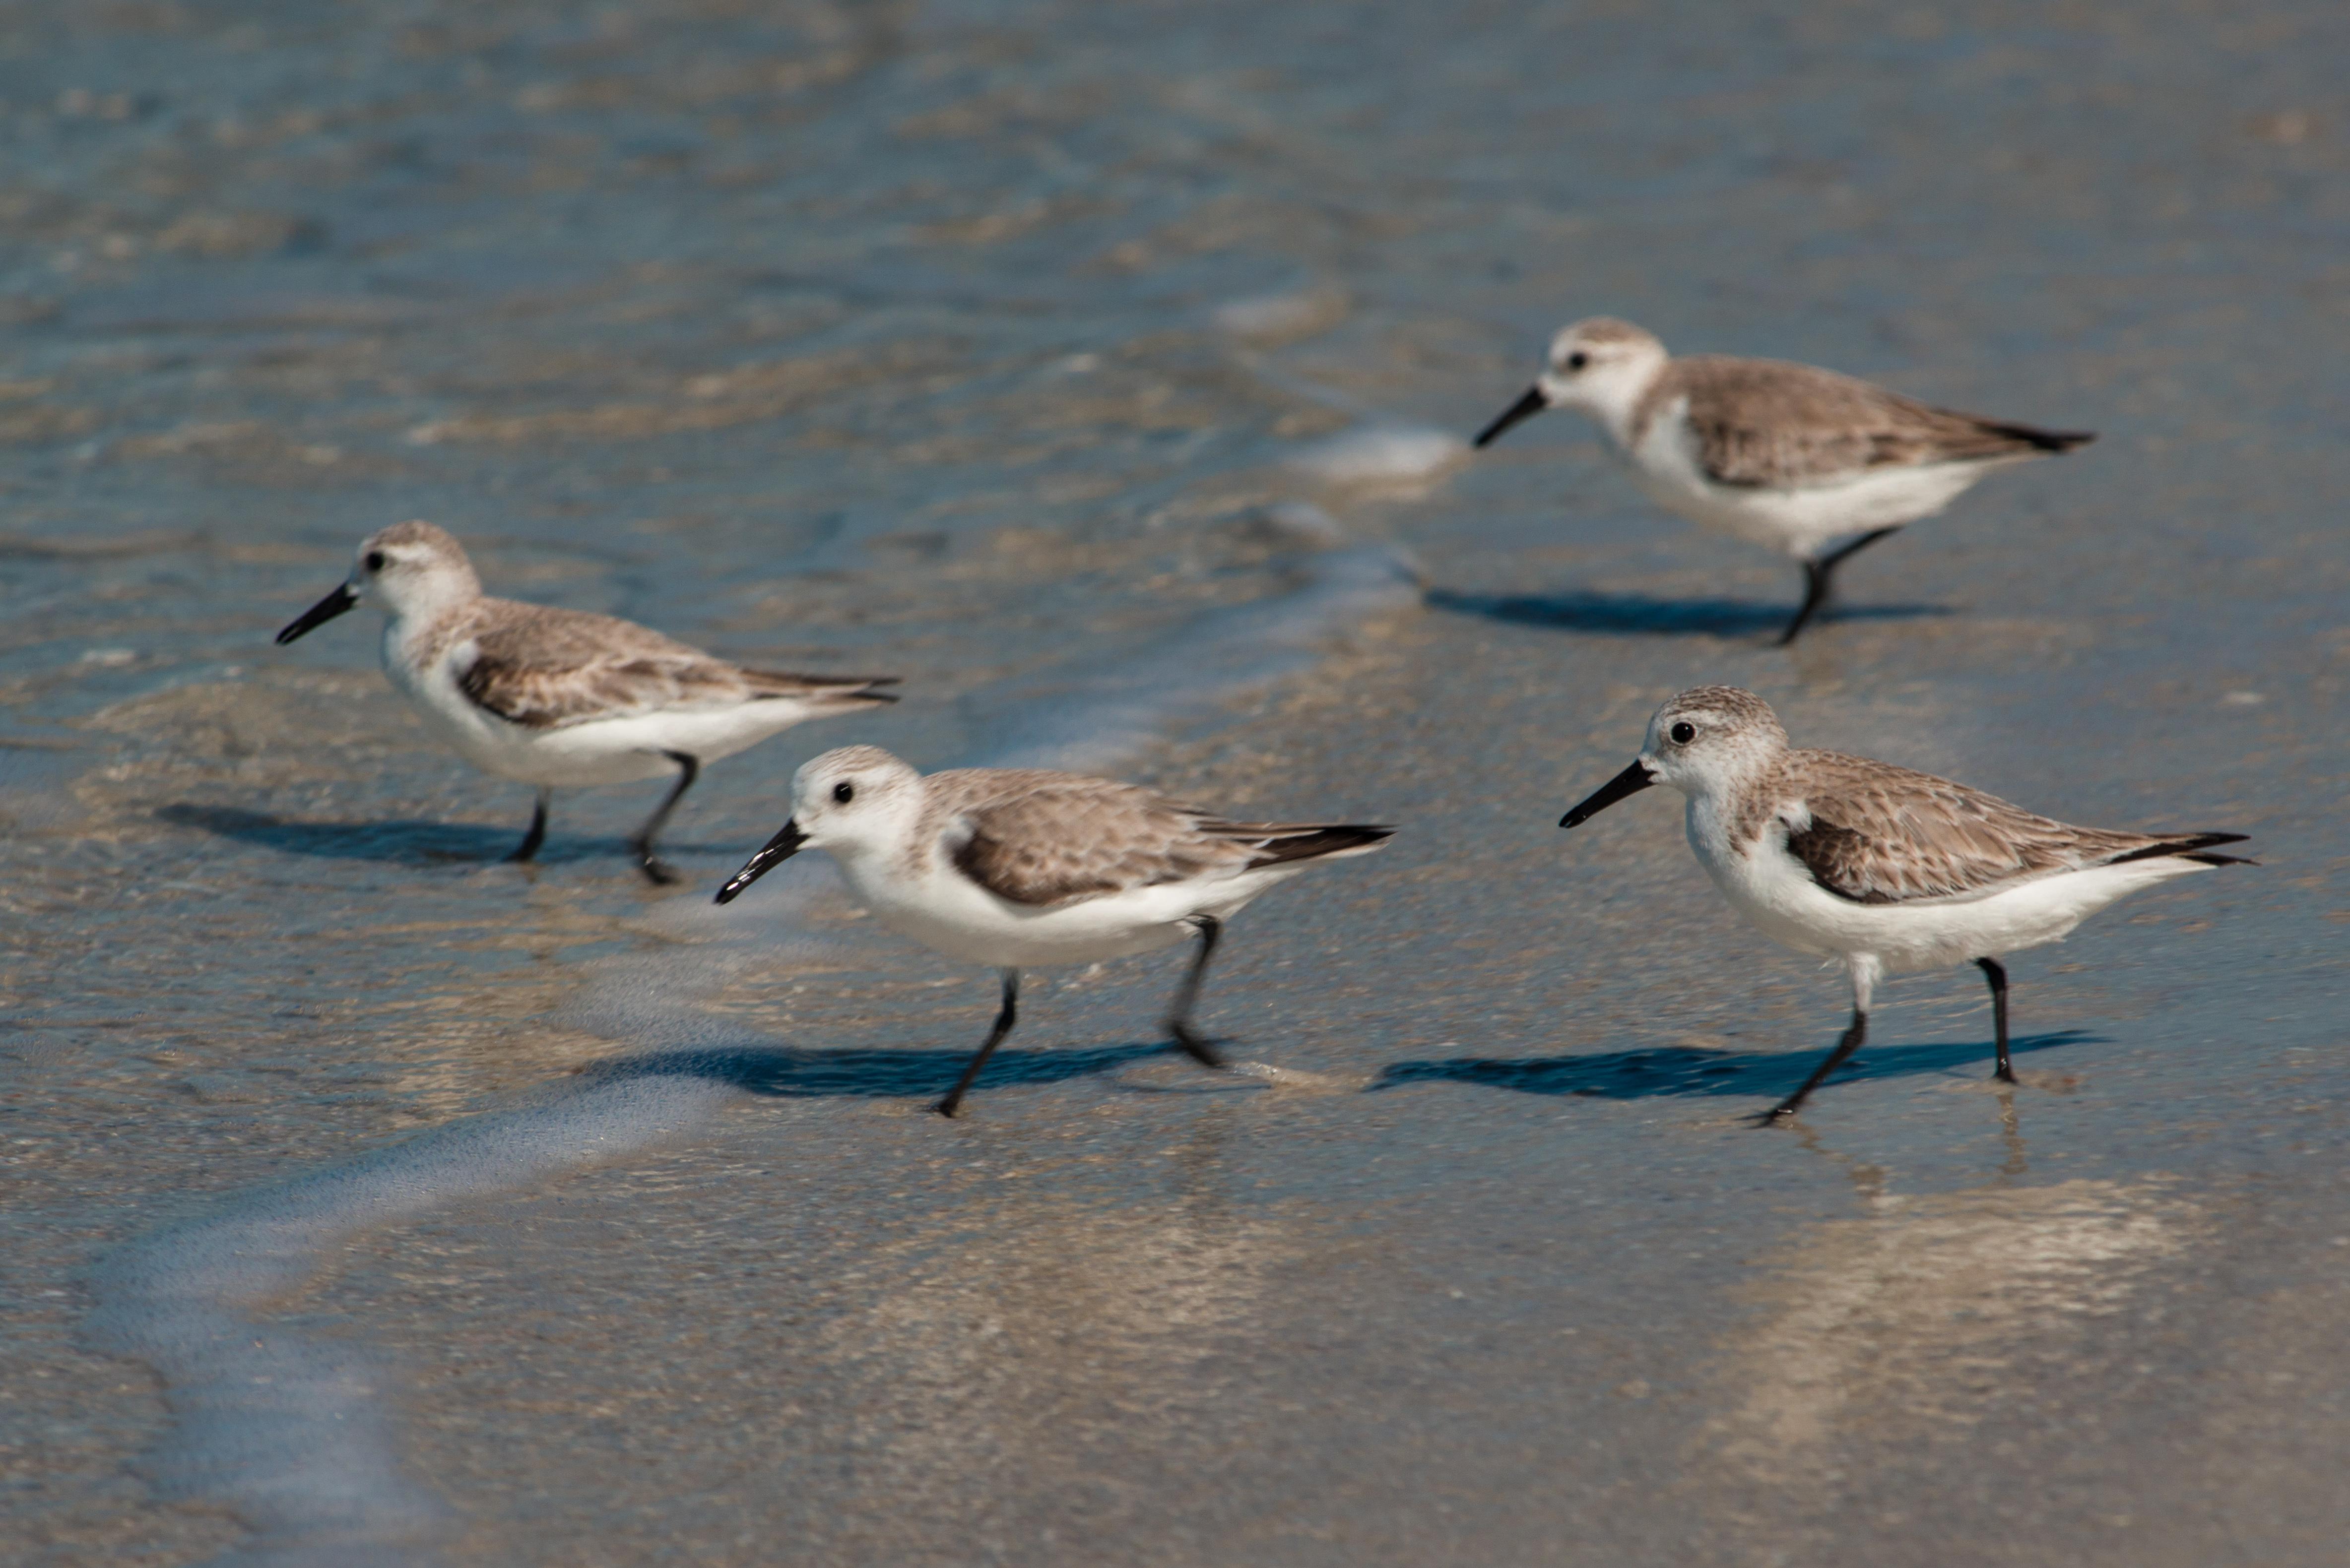 #sandpiper, #birds, #florida, #naples, #sunnyday, #water, #wildlife, #nature